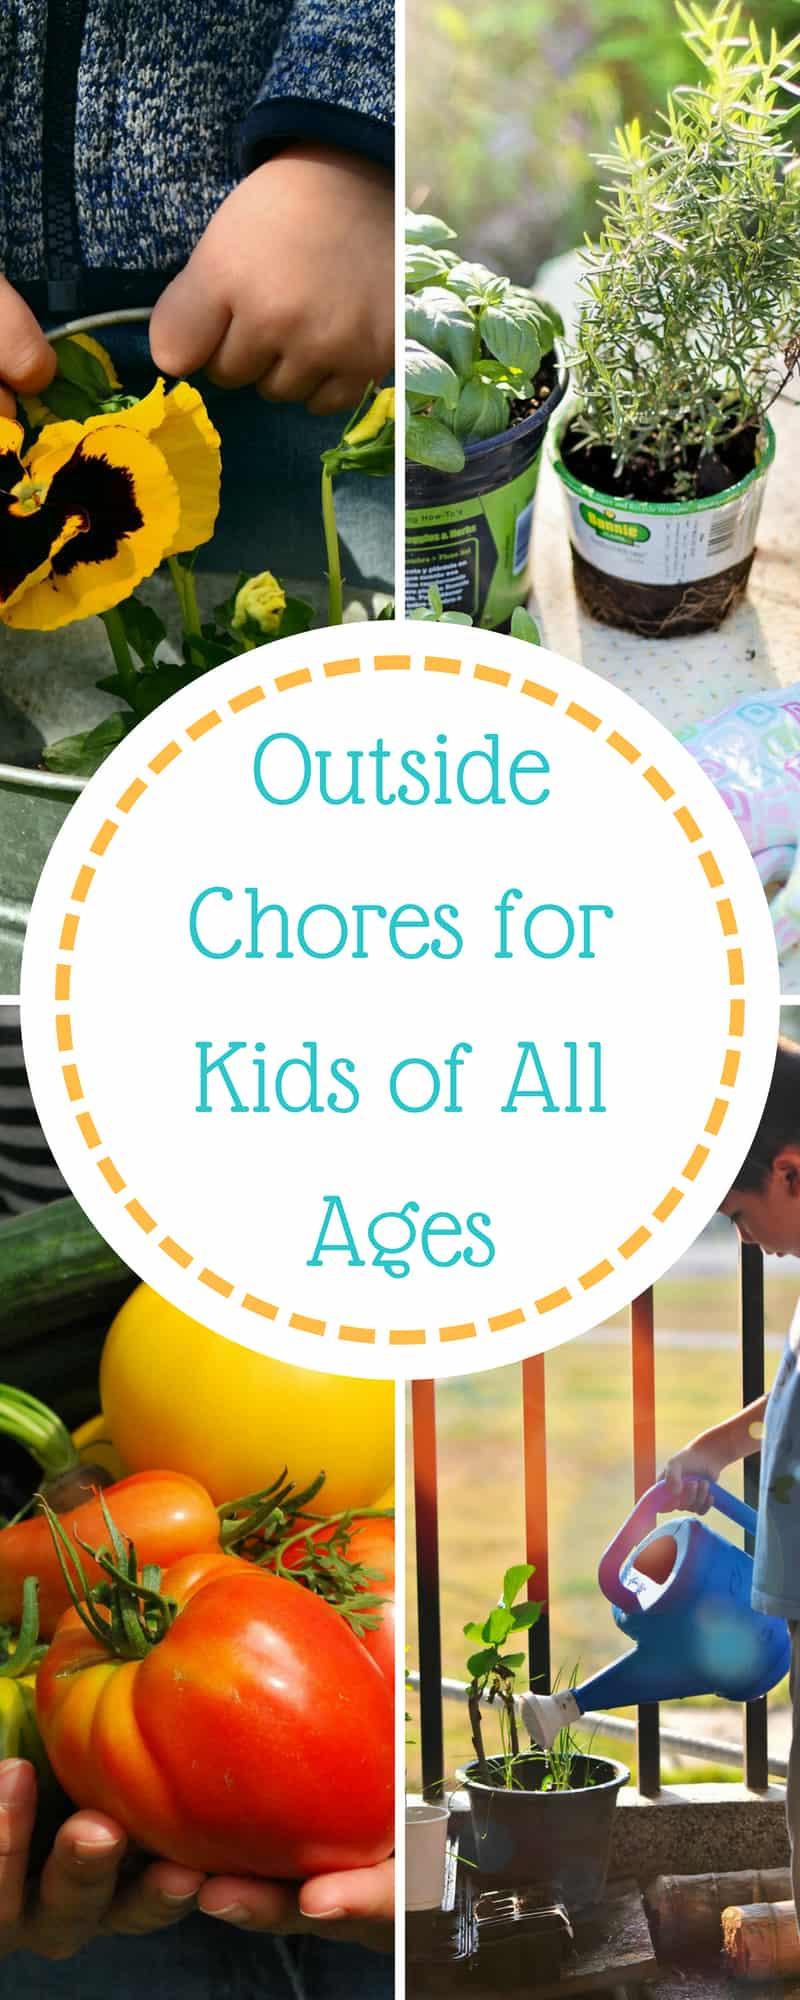 Outside Chores for Kids